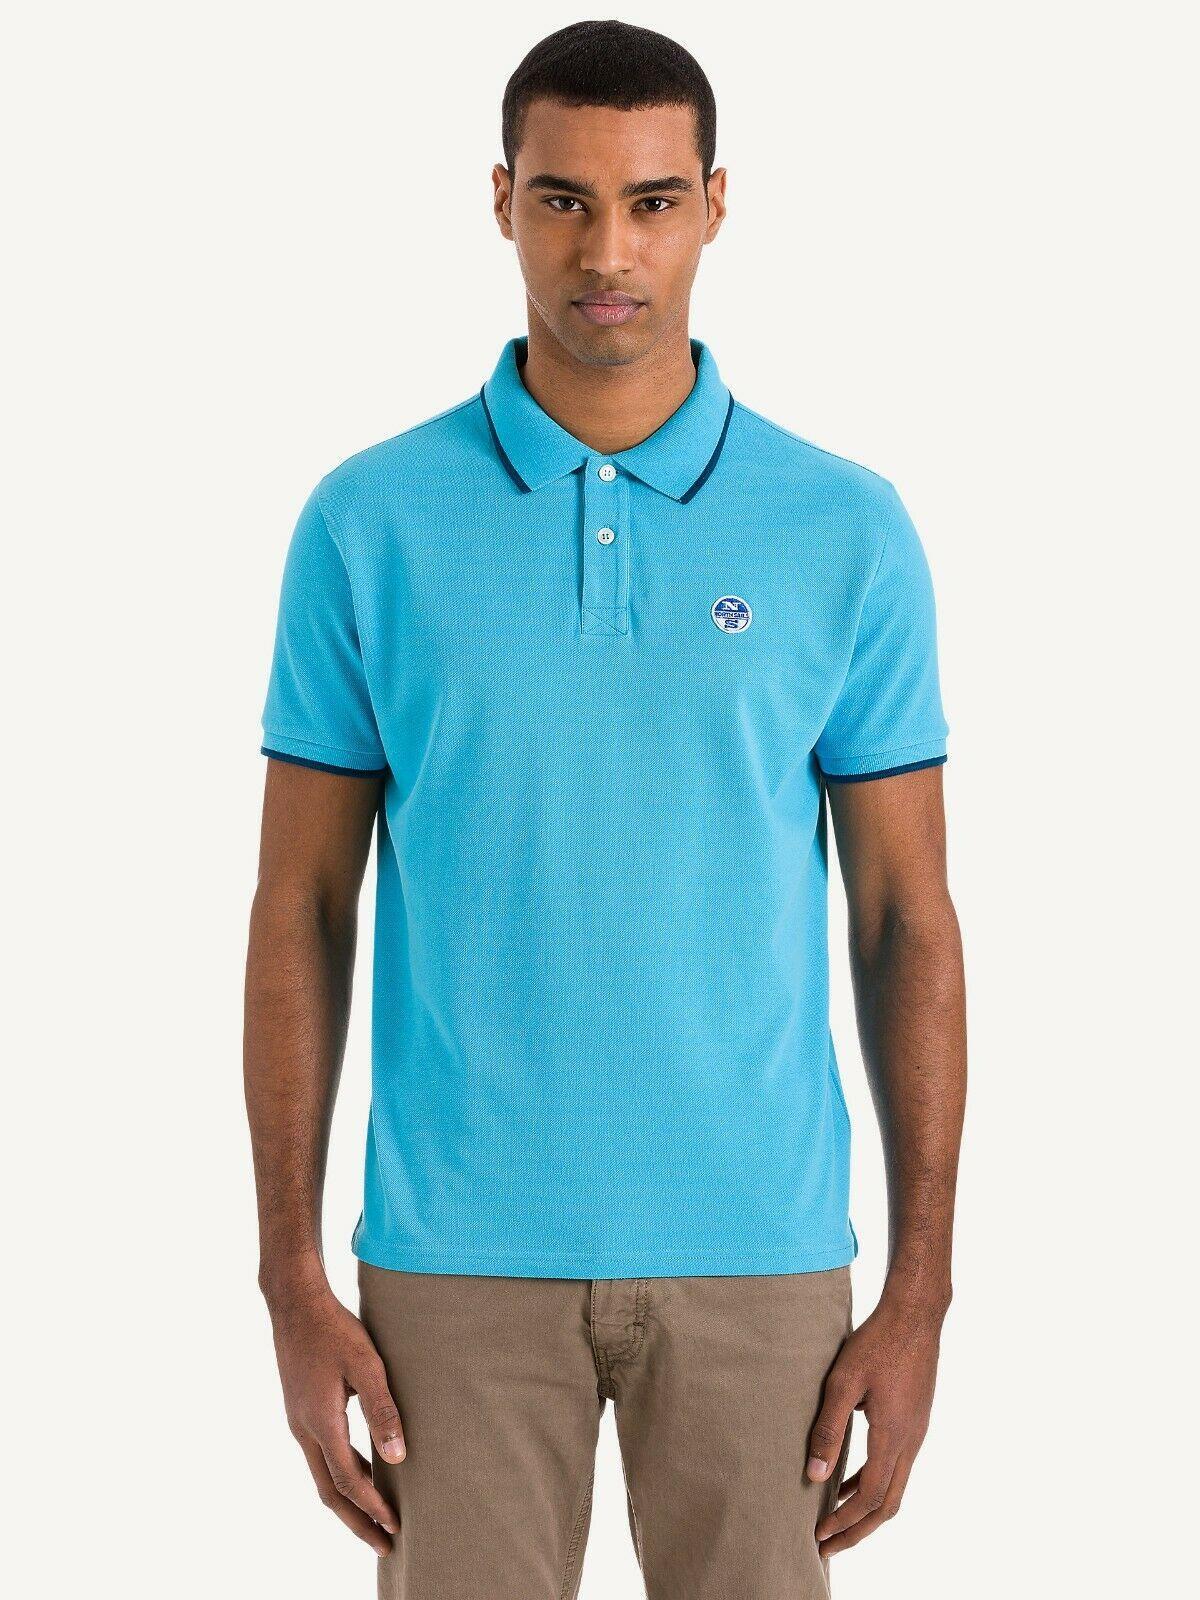 NEW-North-Sails-Legacy-Heritage-Mens-Cotton-Polo-Shirt-Top-Size-S-M-L-XL-XXL-3XL thumbnail 46